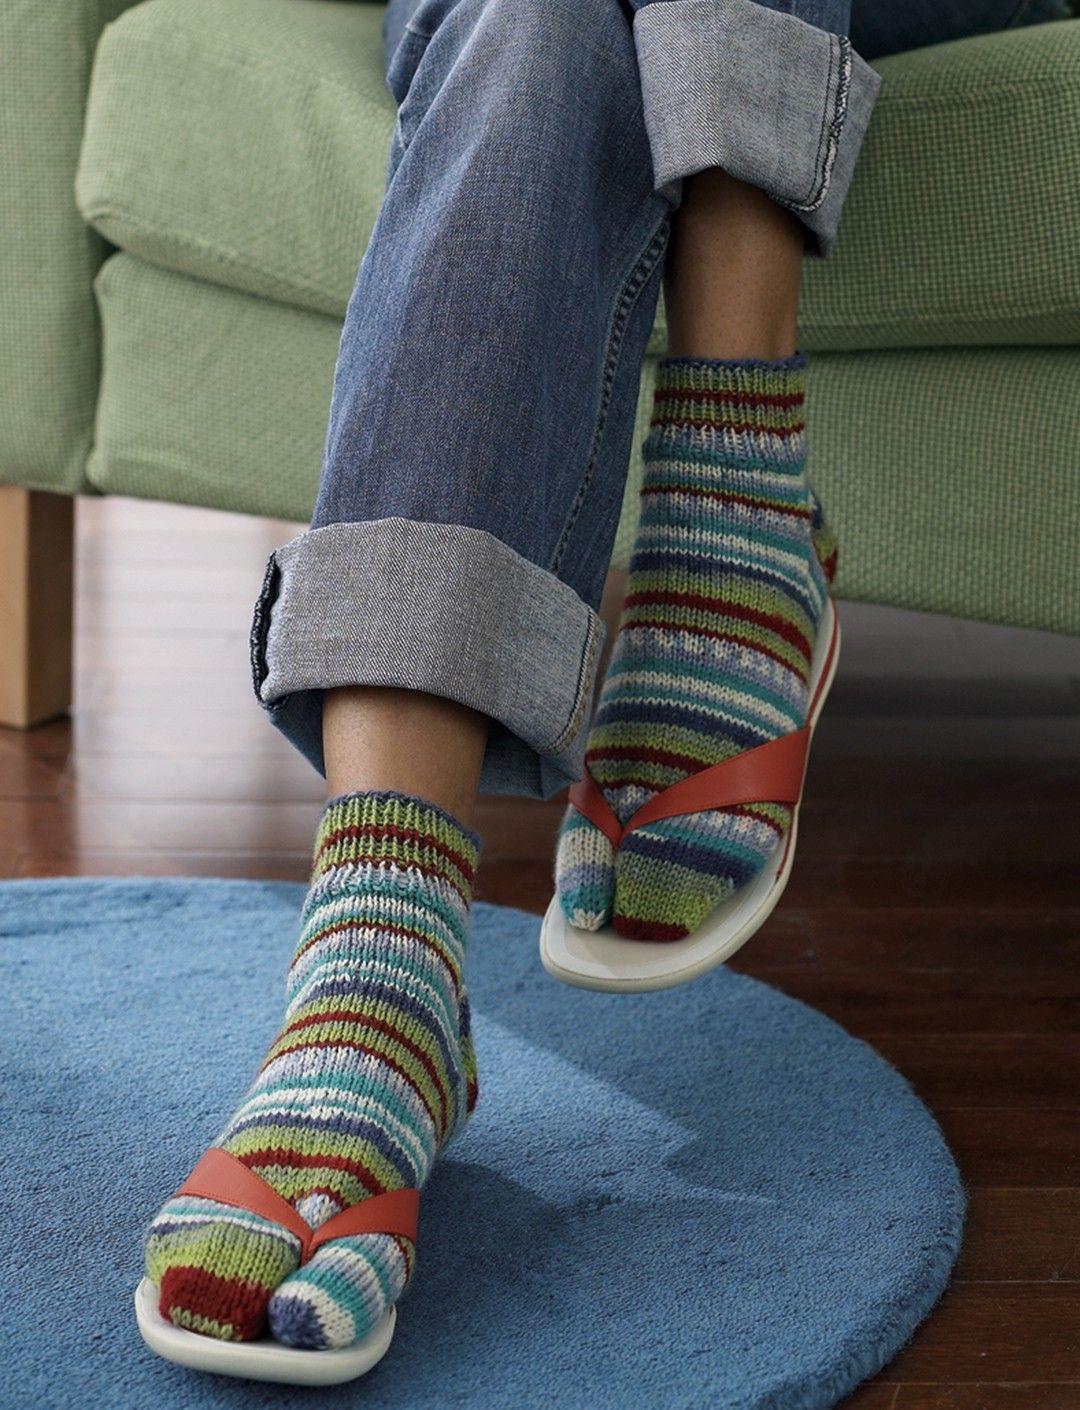 Yarnspirations patons flip flop socks patterns yarnspirations patons flip flop socks patterns yarnspirations bankloansurffo Images